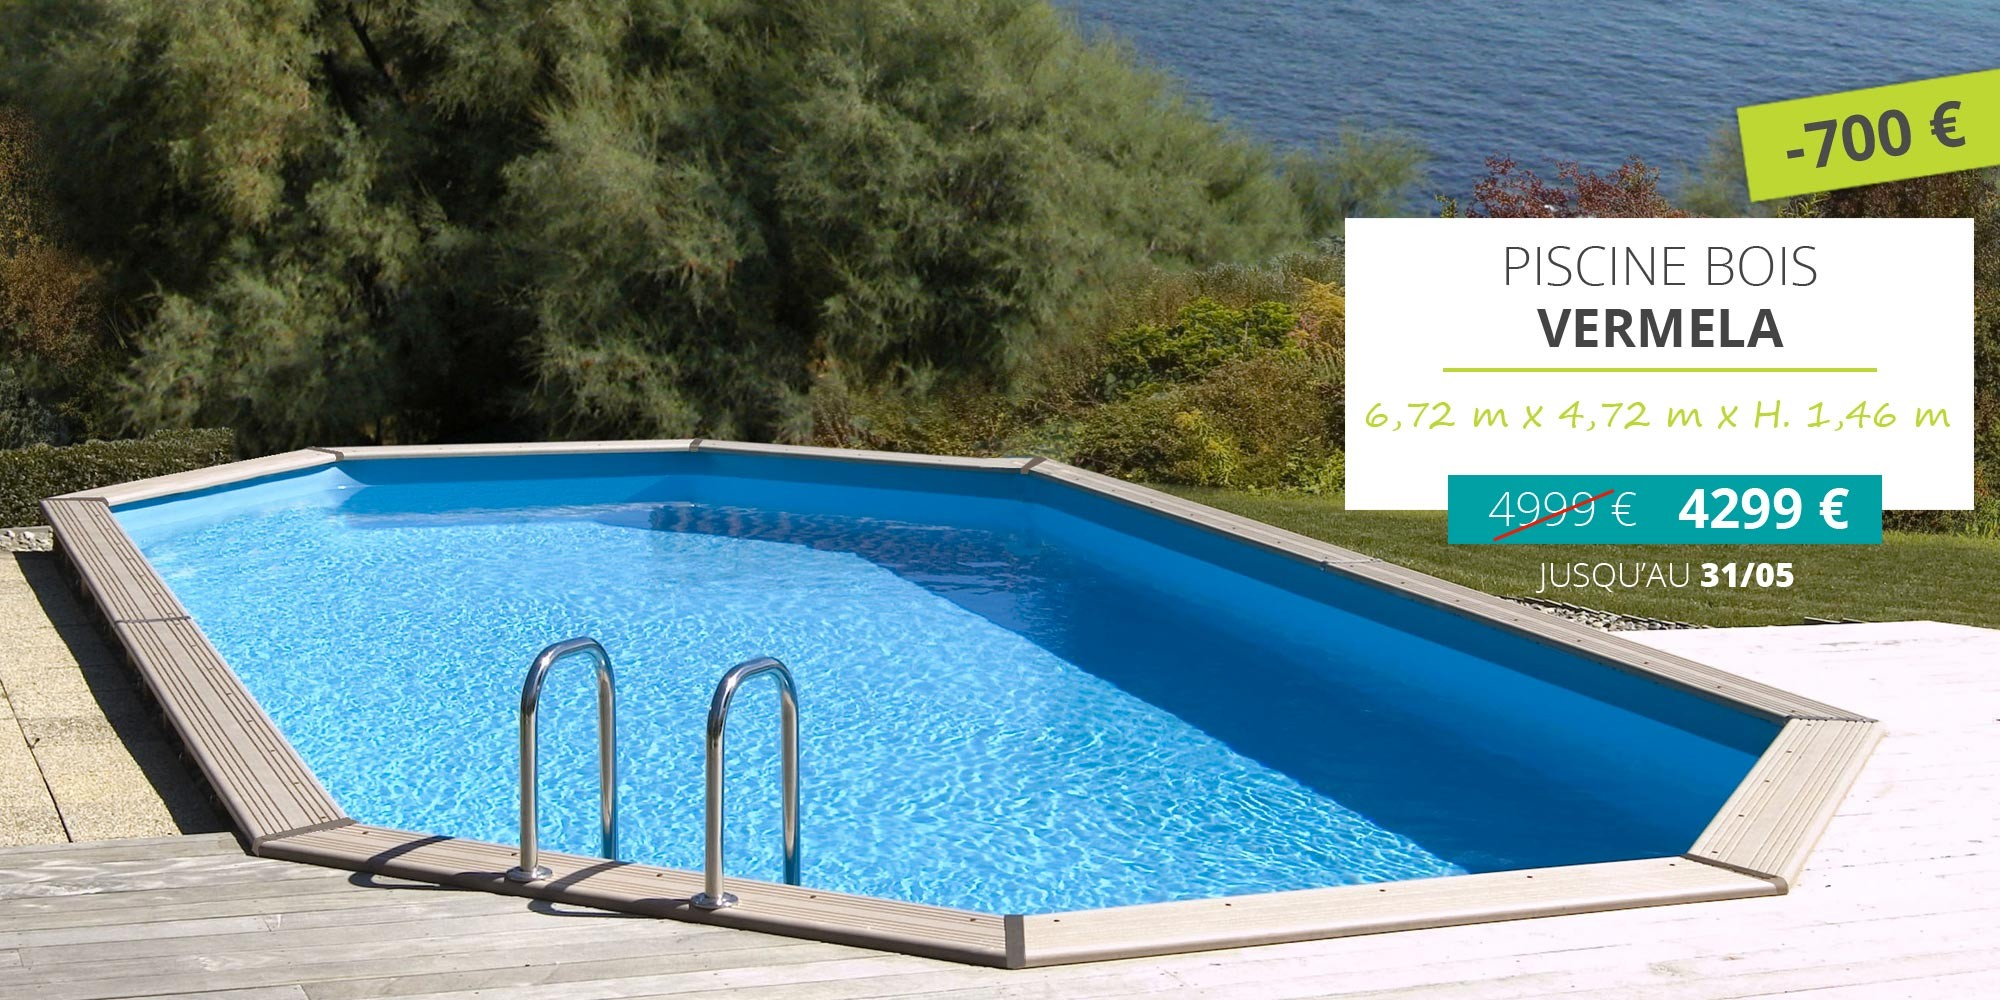 -700 € sur la piscine bois Vermela, piscine bois ovale